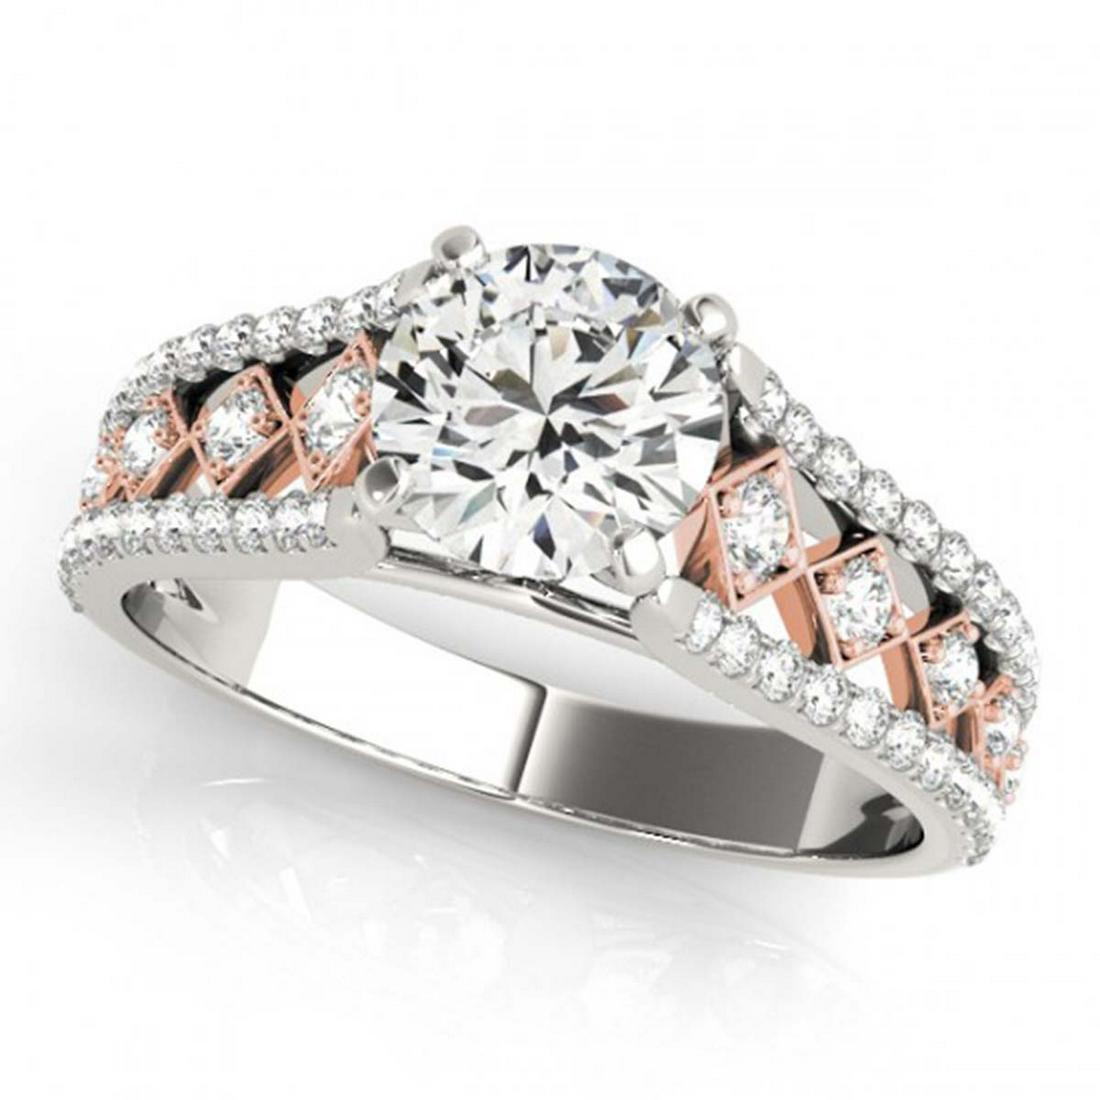 1 ctw VS/SI Diamond Solitaire Ring 14K White & Rose